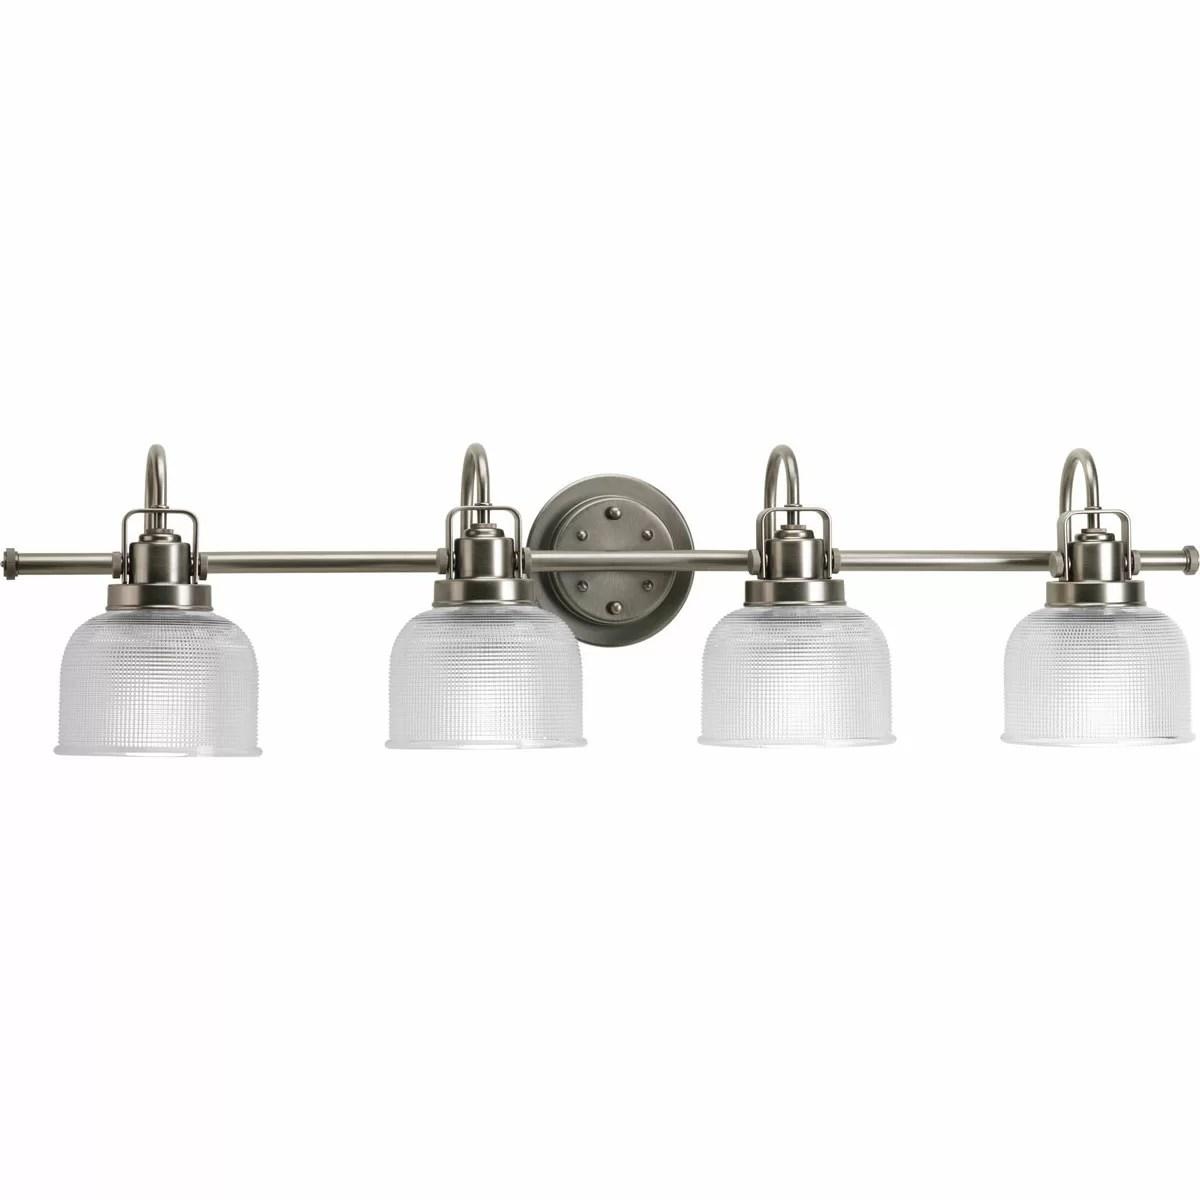 Mercury Row Williamson 4 Light Bath Vanity Light & Reviews ... on Wayfair Bathroom Sconces id=64266